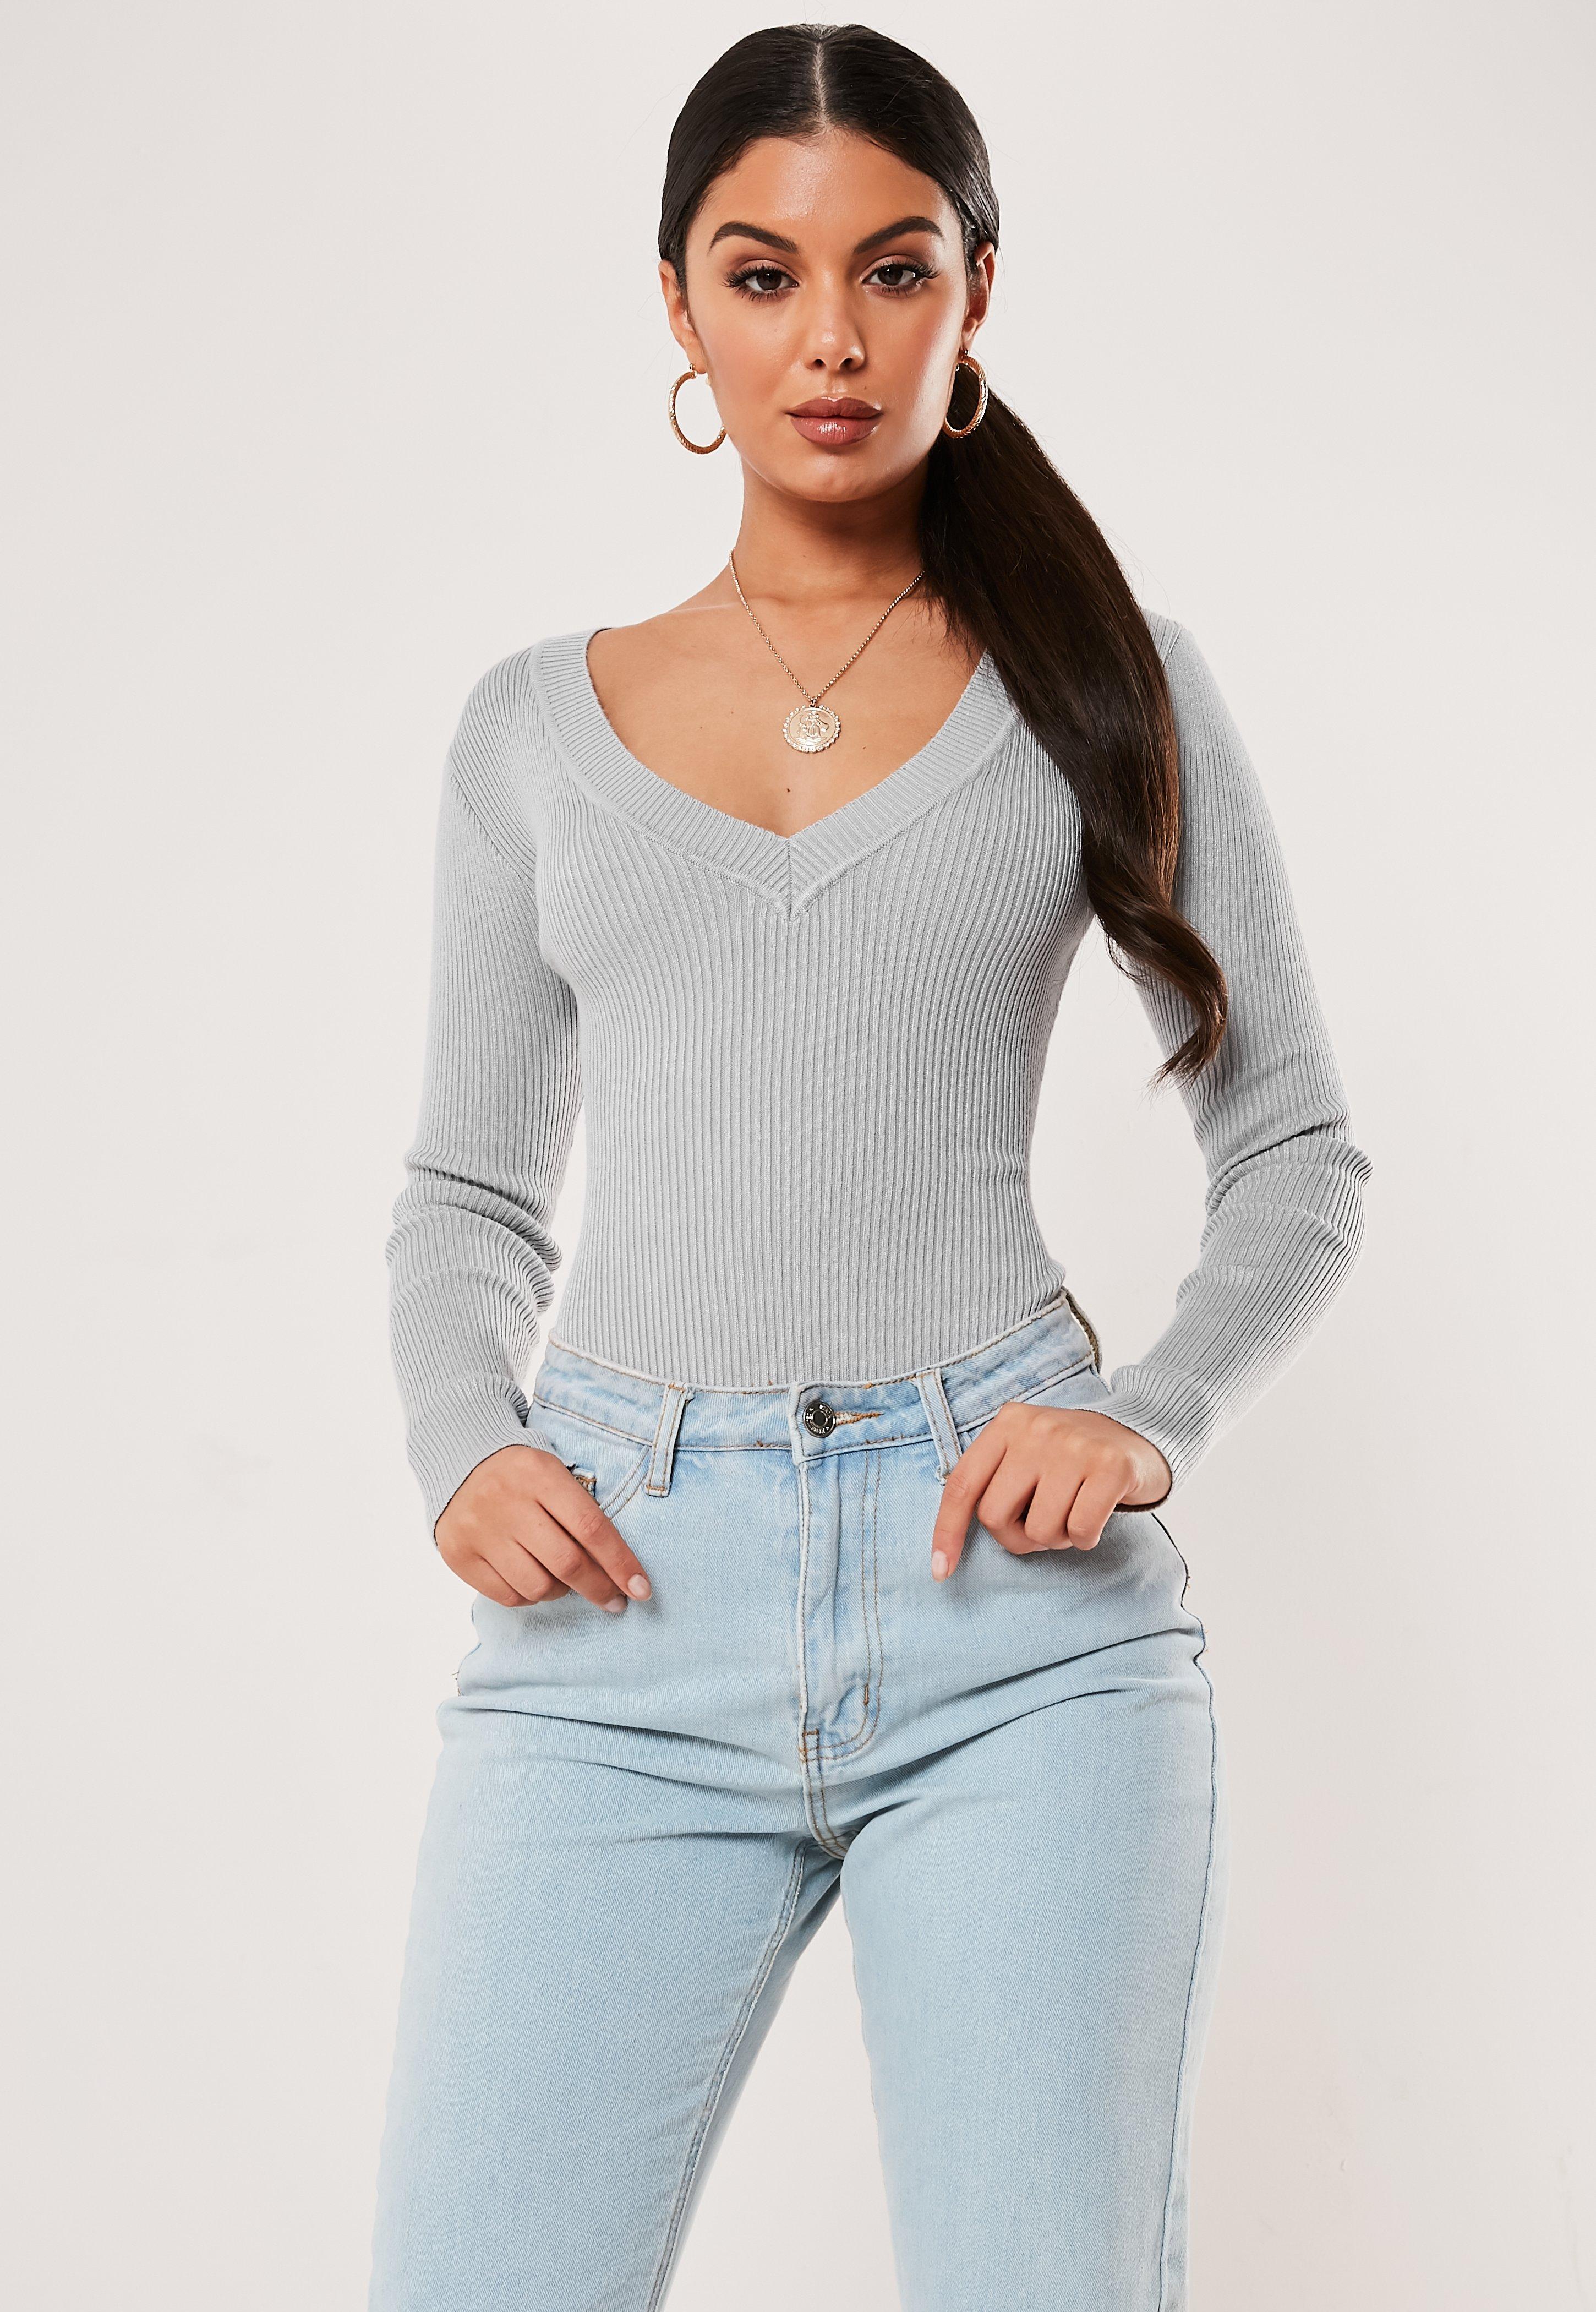 Long Sleeve Bodysuits Online Missguided Ireland Timberland 14865xsbn 12 Coklat Rosegold